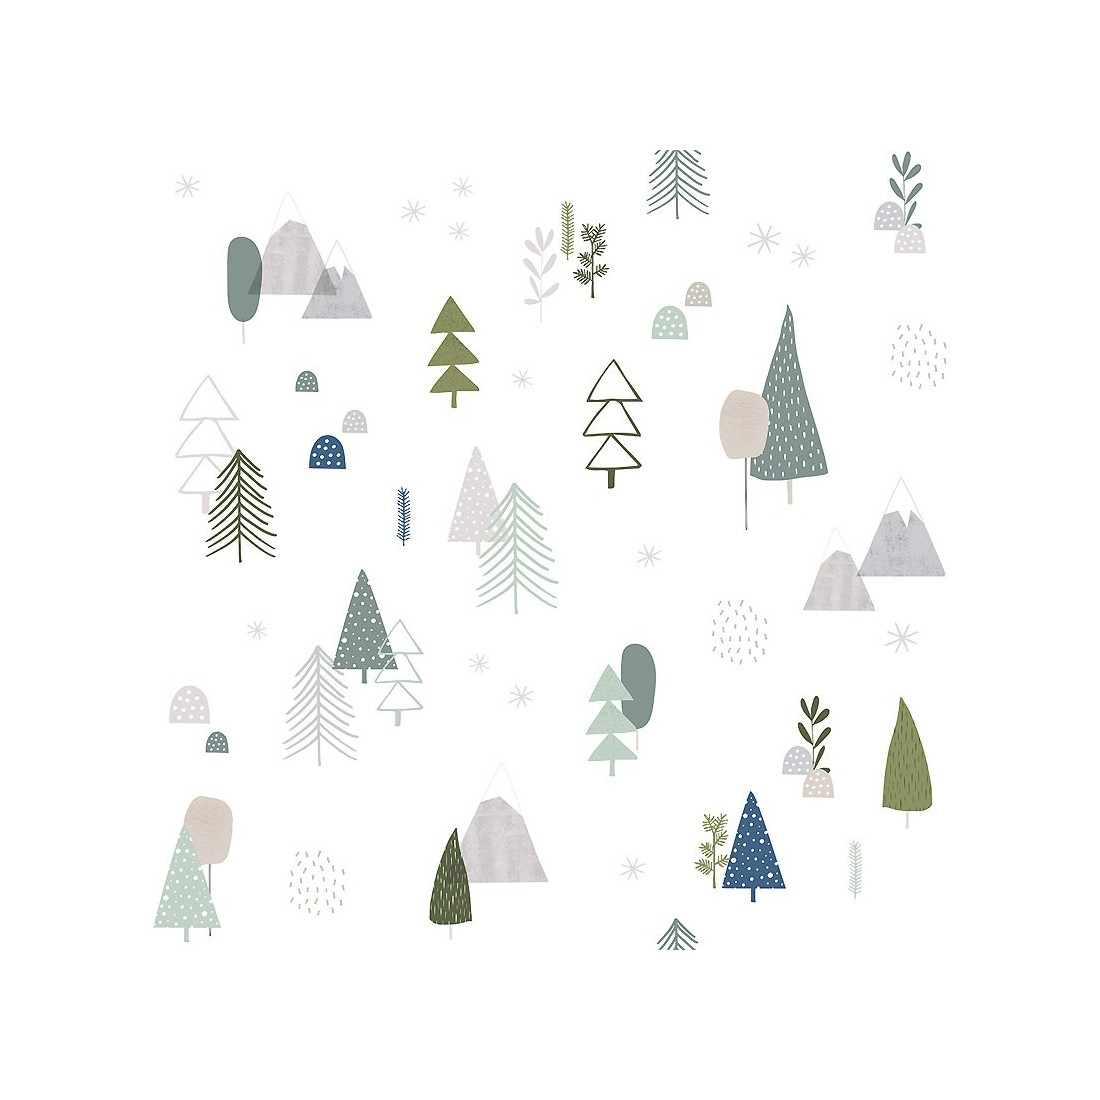 papier peint enfant arbres de for t lilipinso ma chambramoi. Black Bedroom Furniture Sets. Home Design Ideas